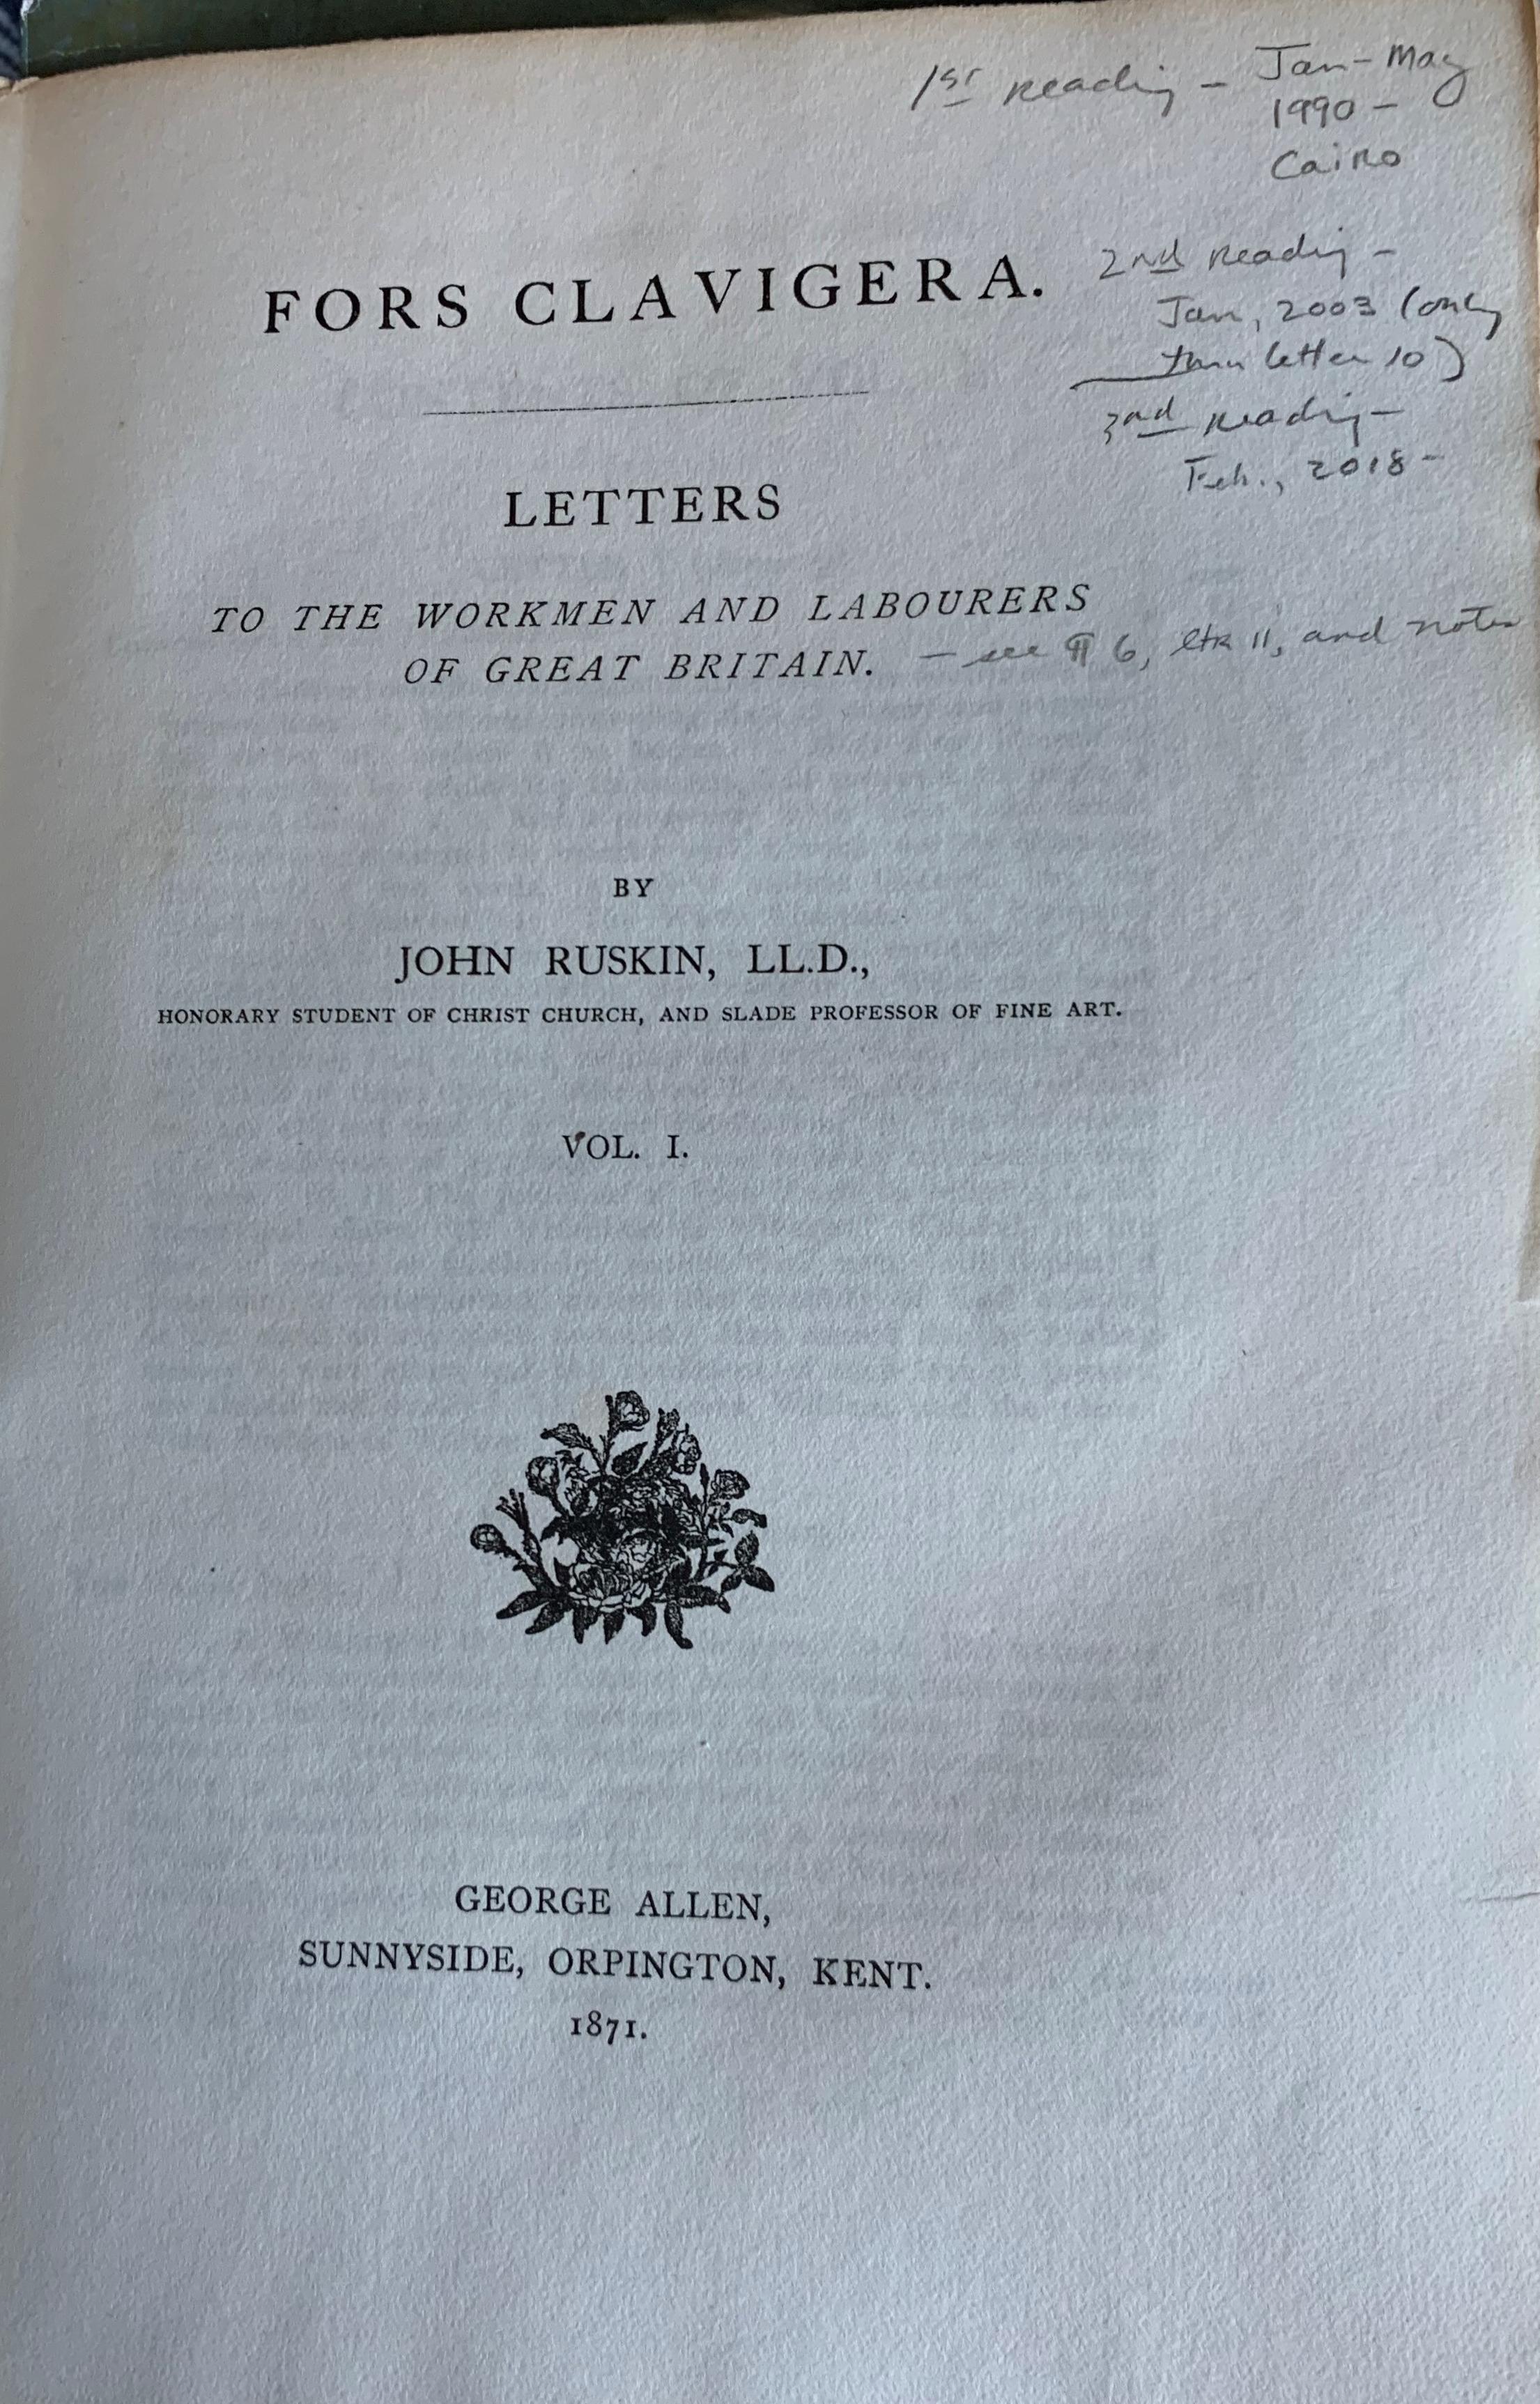 Fors Letter 1 Titlr Page